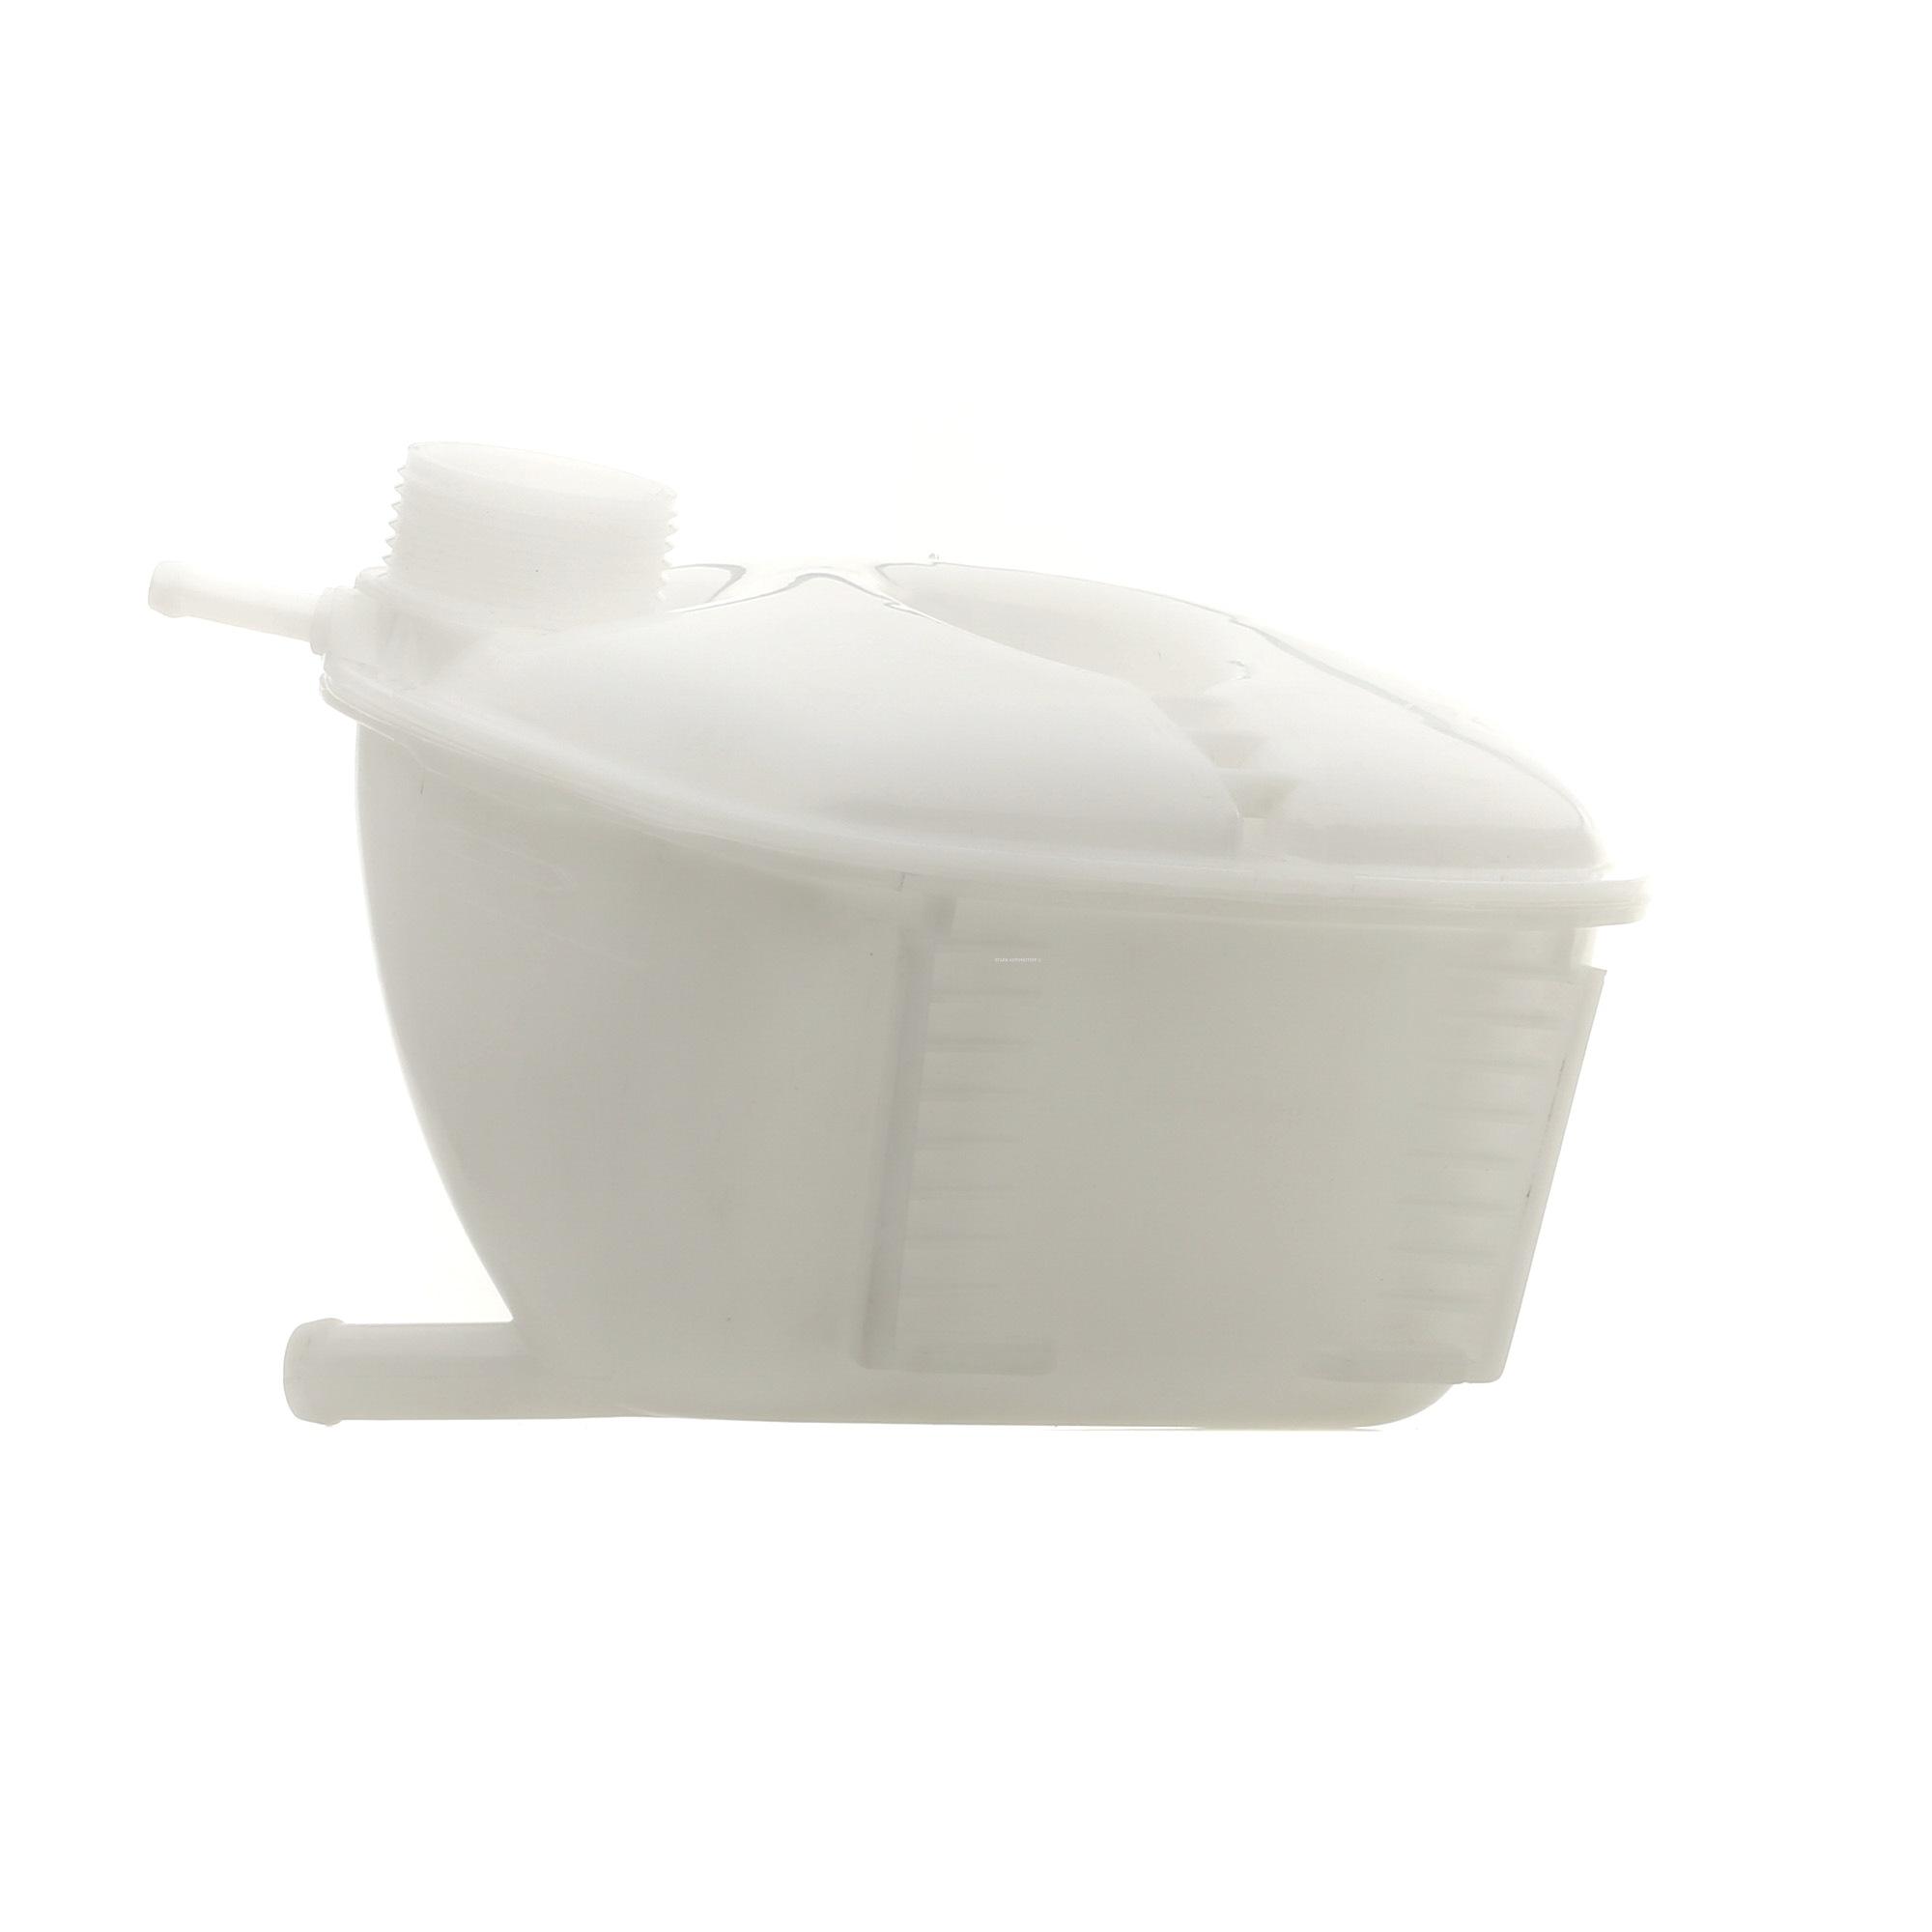 Original NISSAN Kühlwasserbehälter SKET-0960042